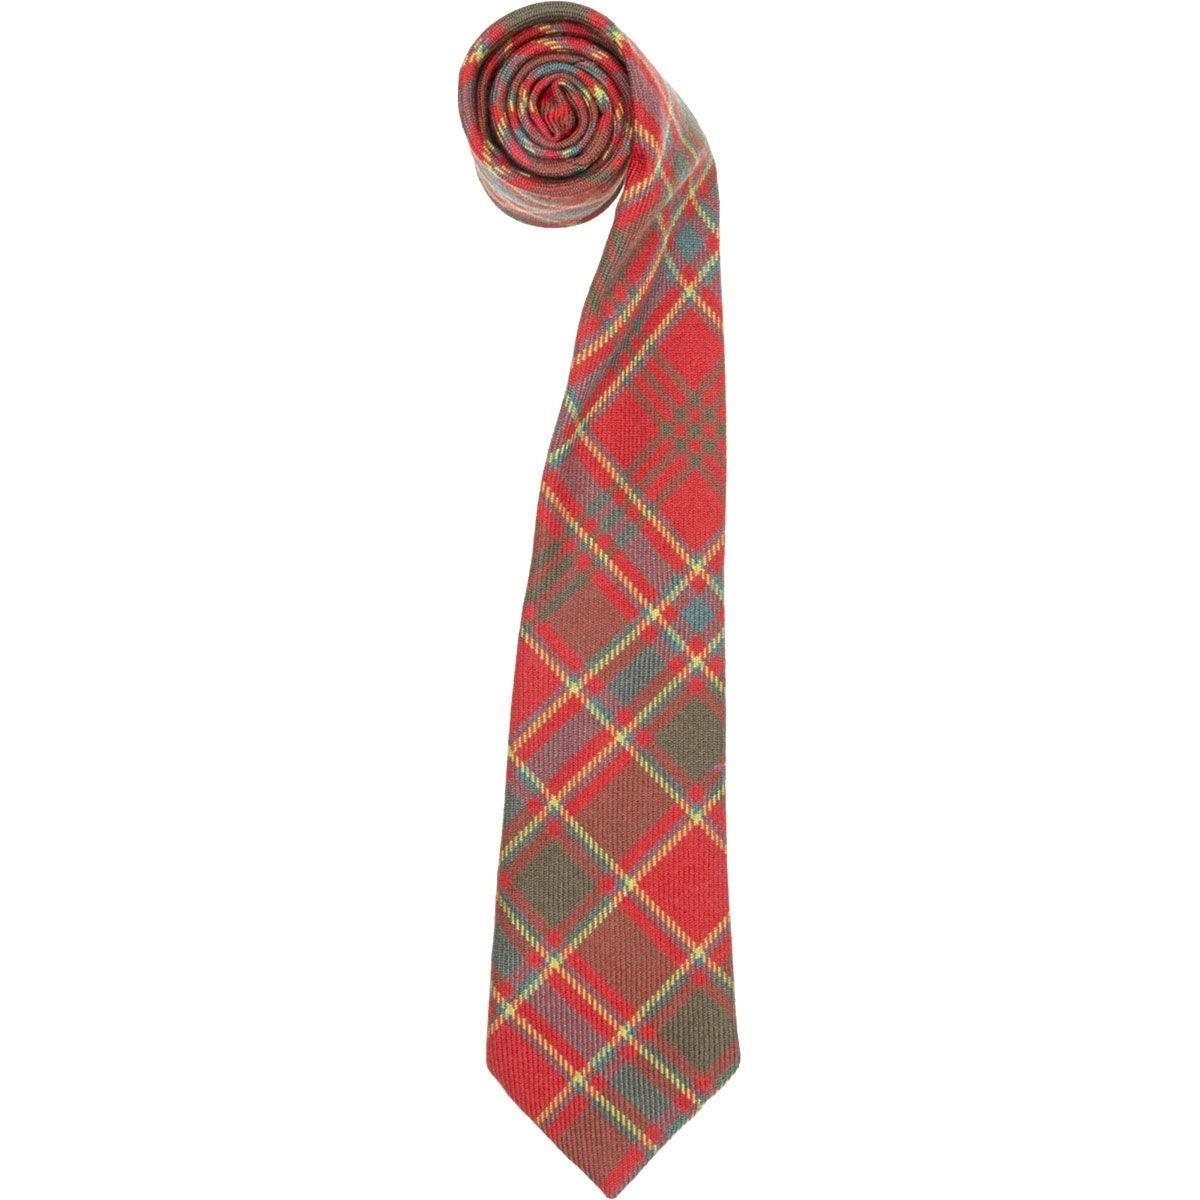 Made to Order Strome Heavyweight Tartan Tie